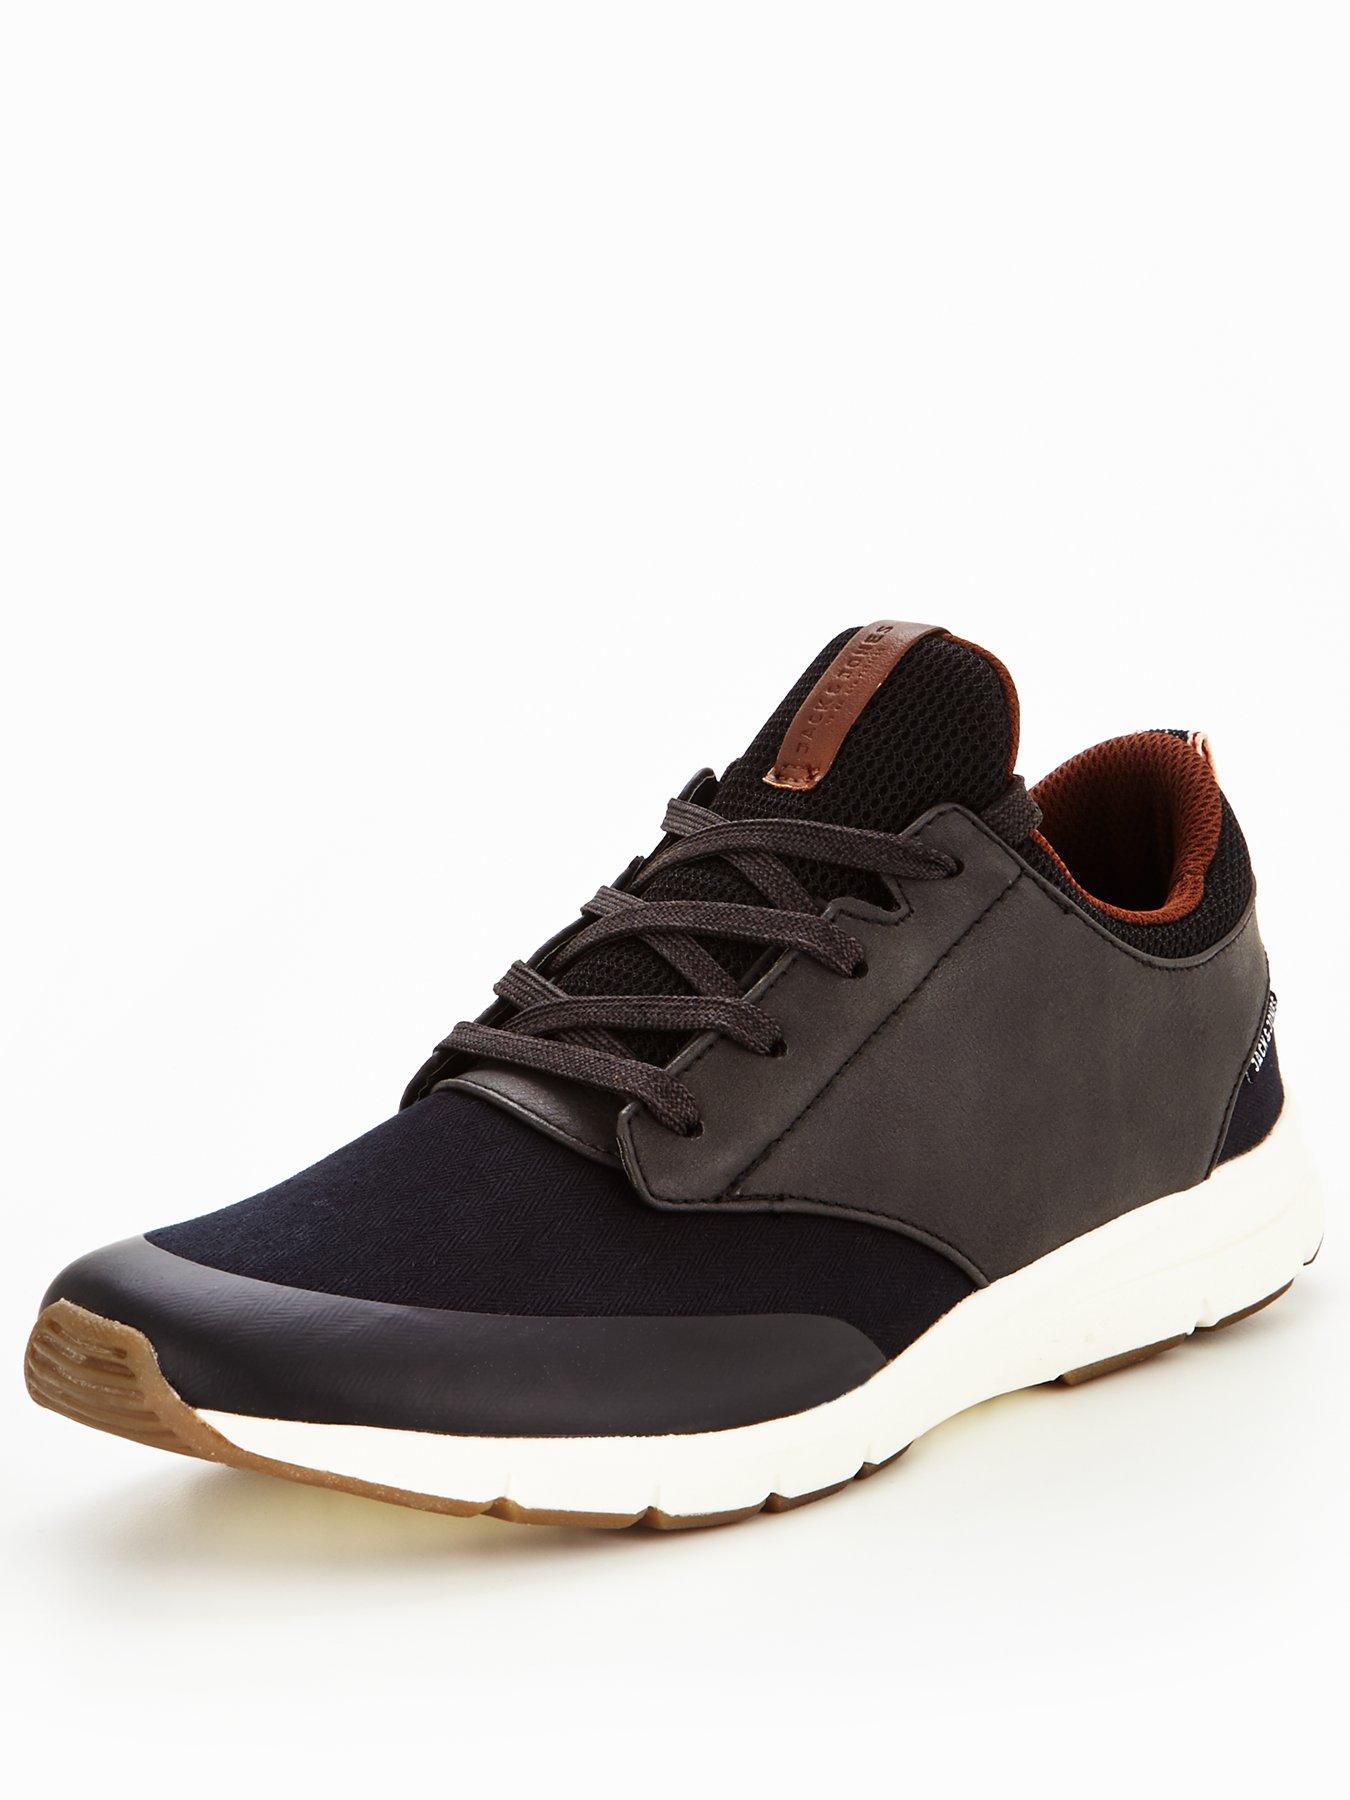 Jack Jones Jack Jones Bolton Trainer 1600171198 Men's Shoes Jack Jones Shoes